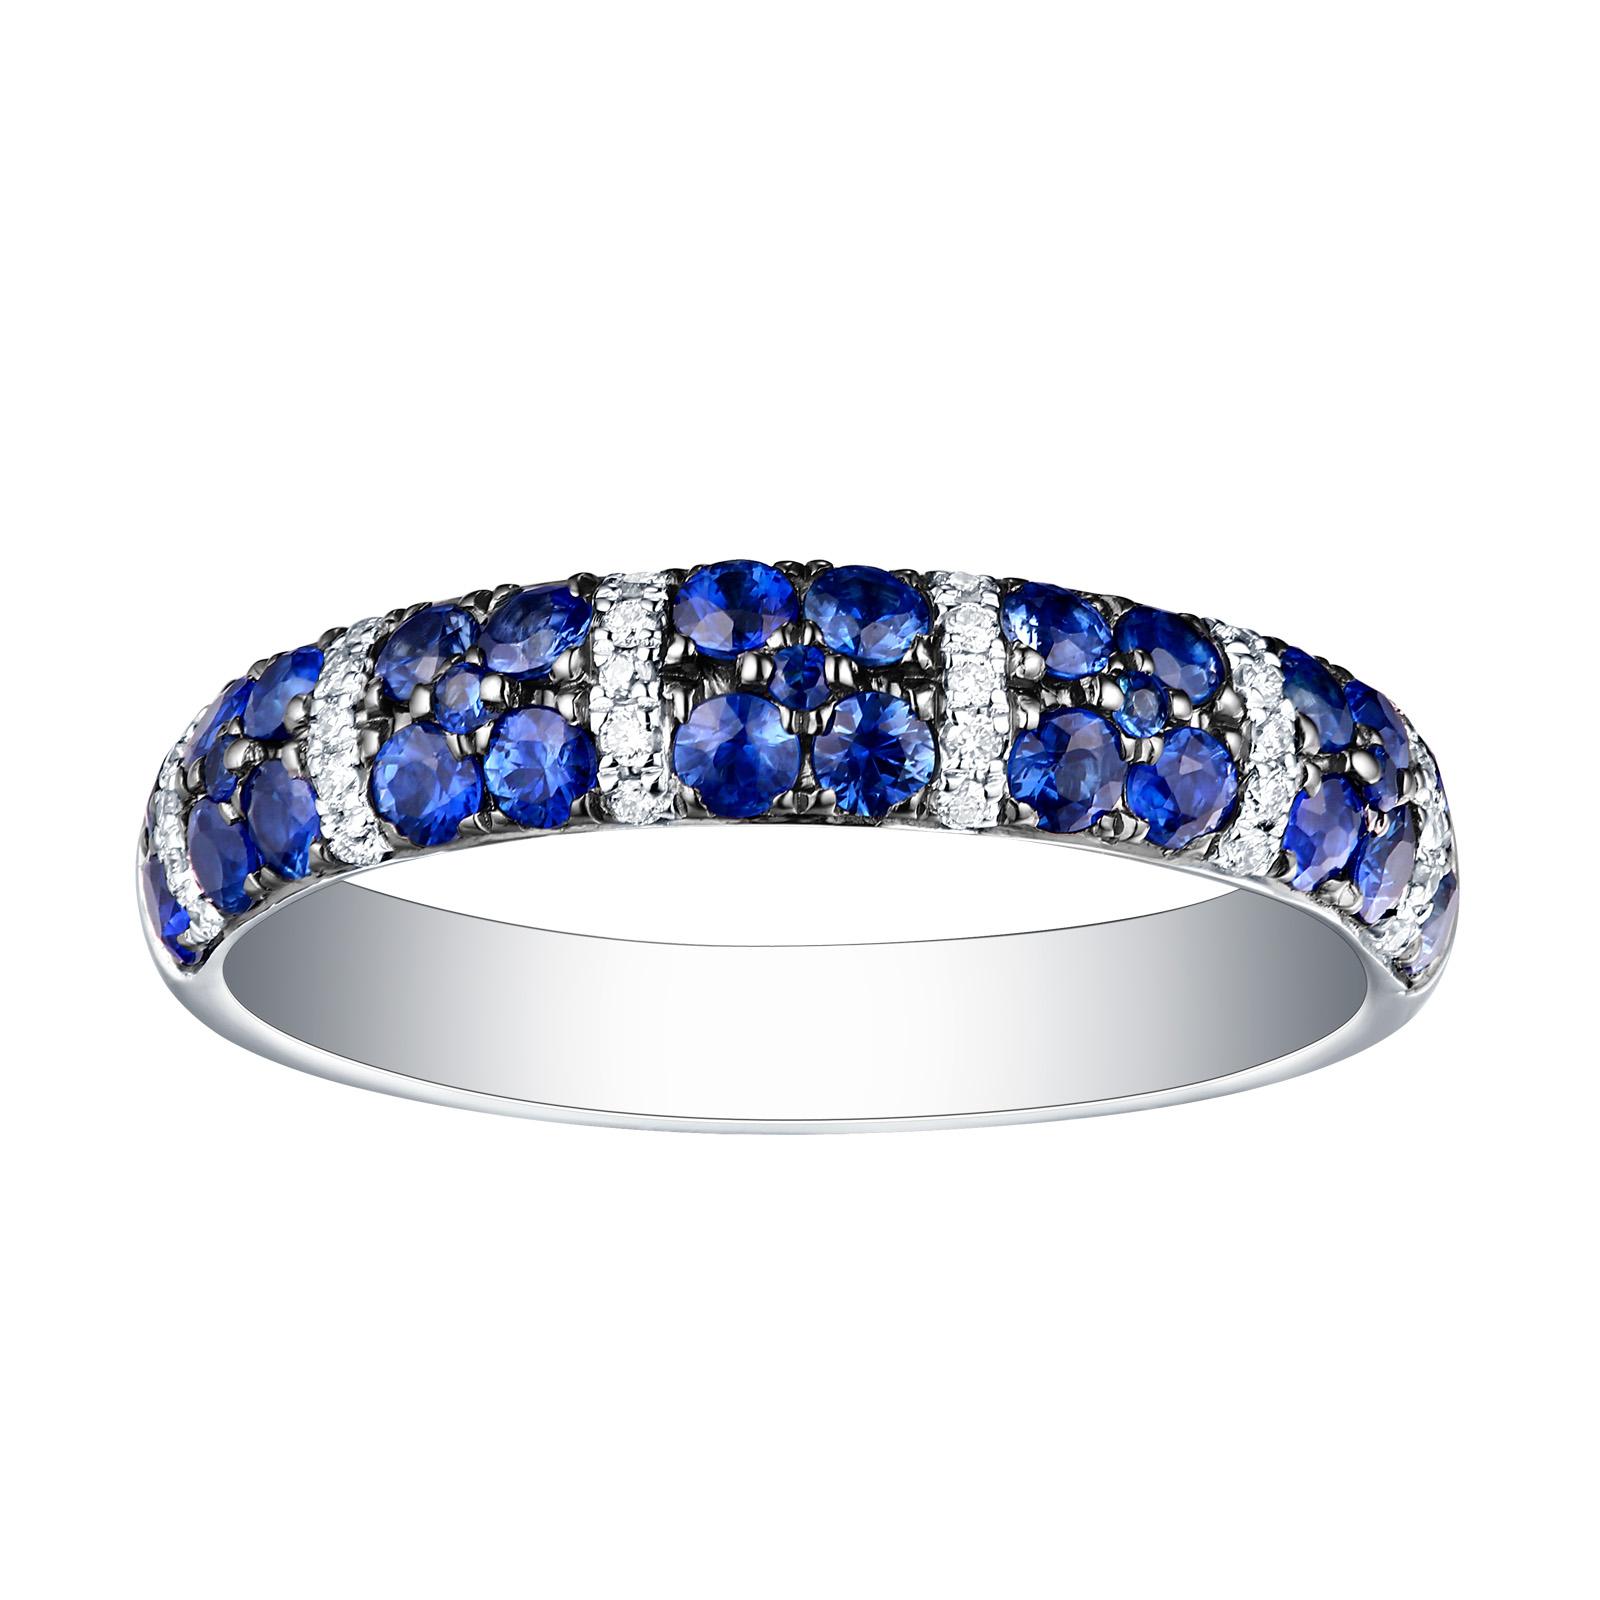 R22832BSA – 14K White Gold Blue Sapphire and Diamond Ring, 0.98 TCW